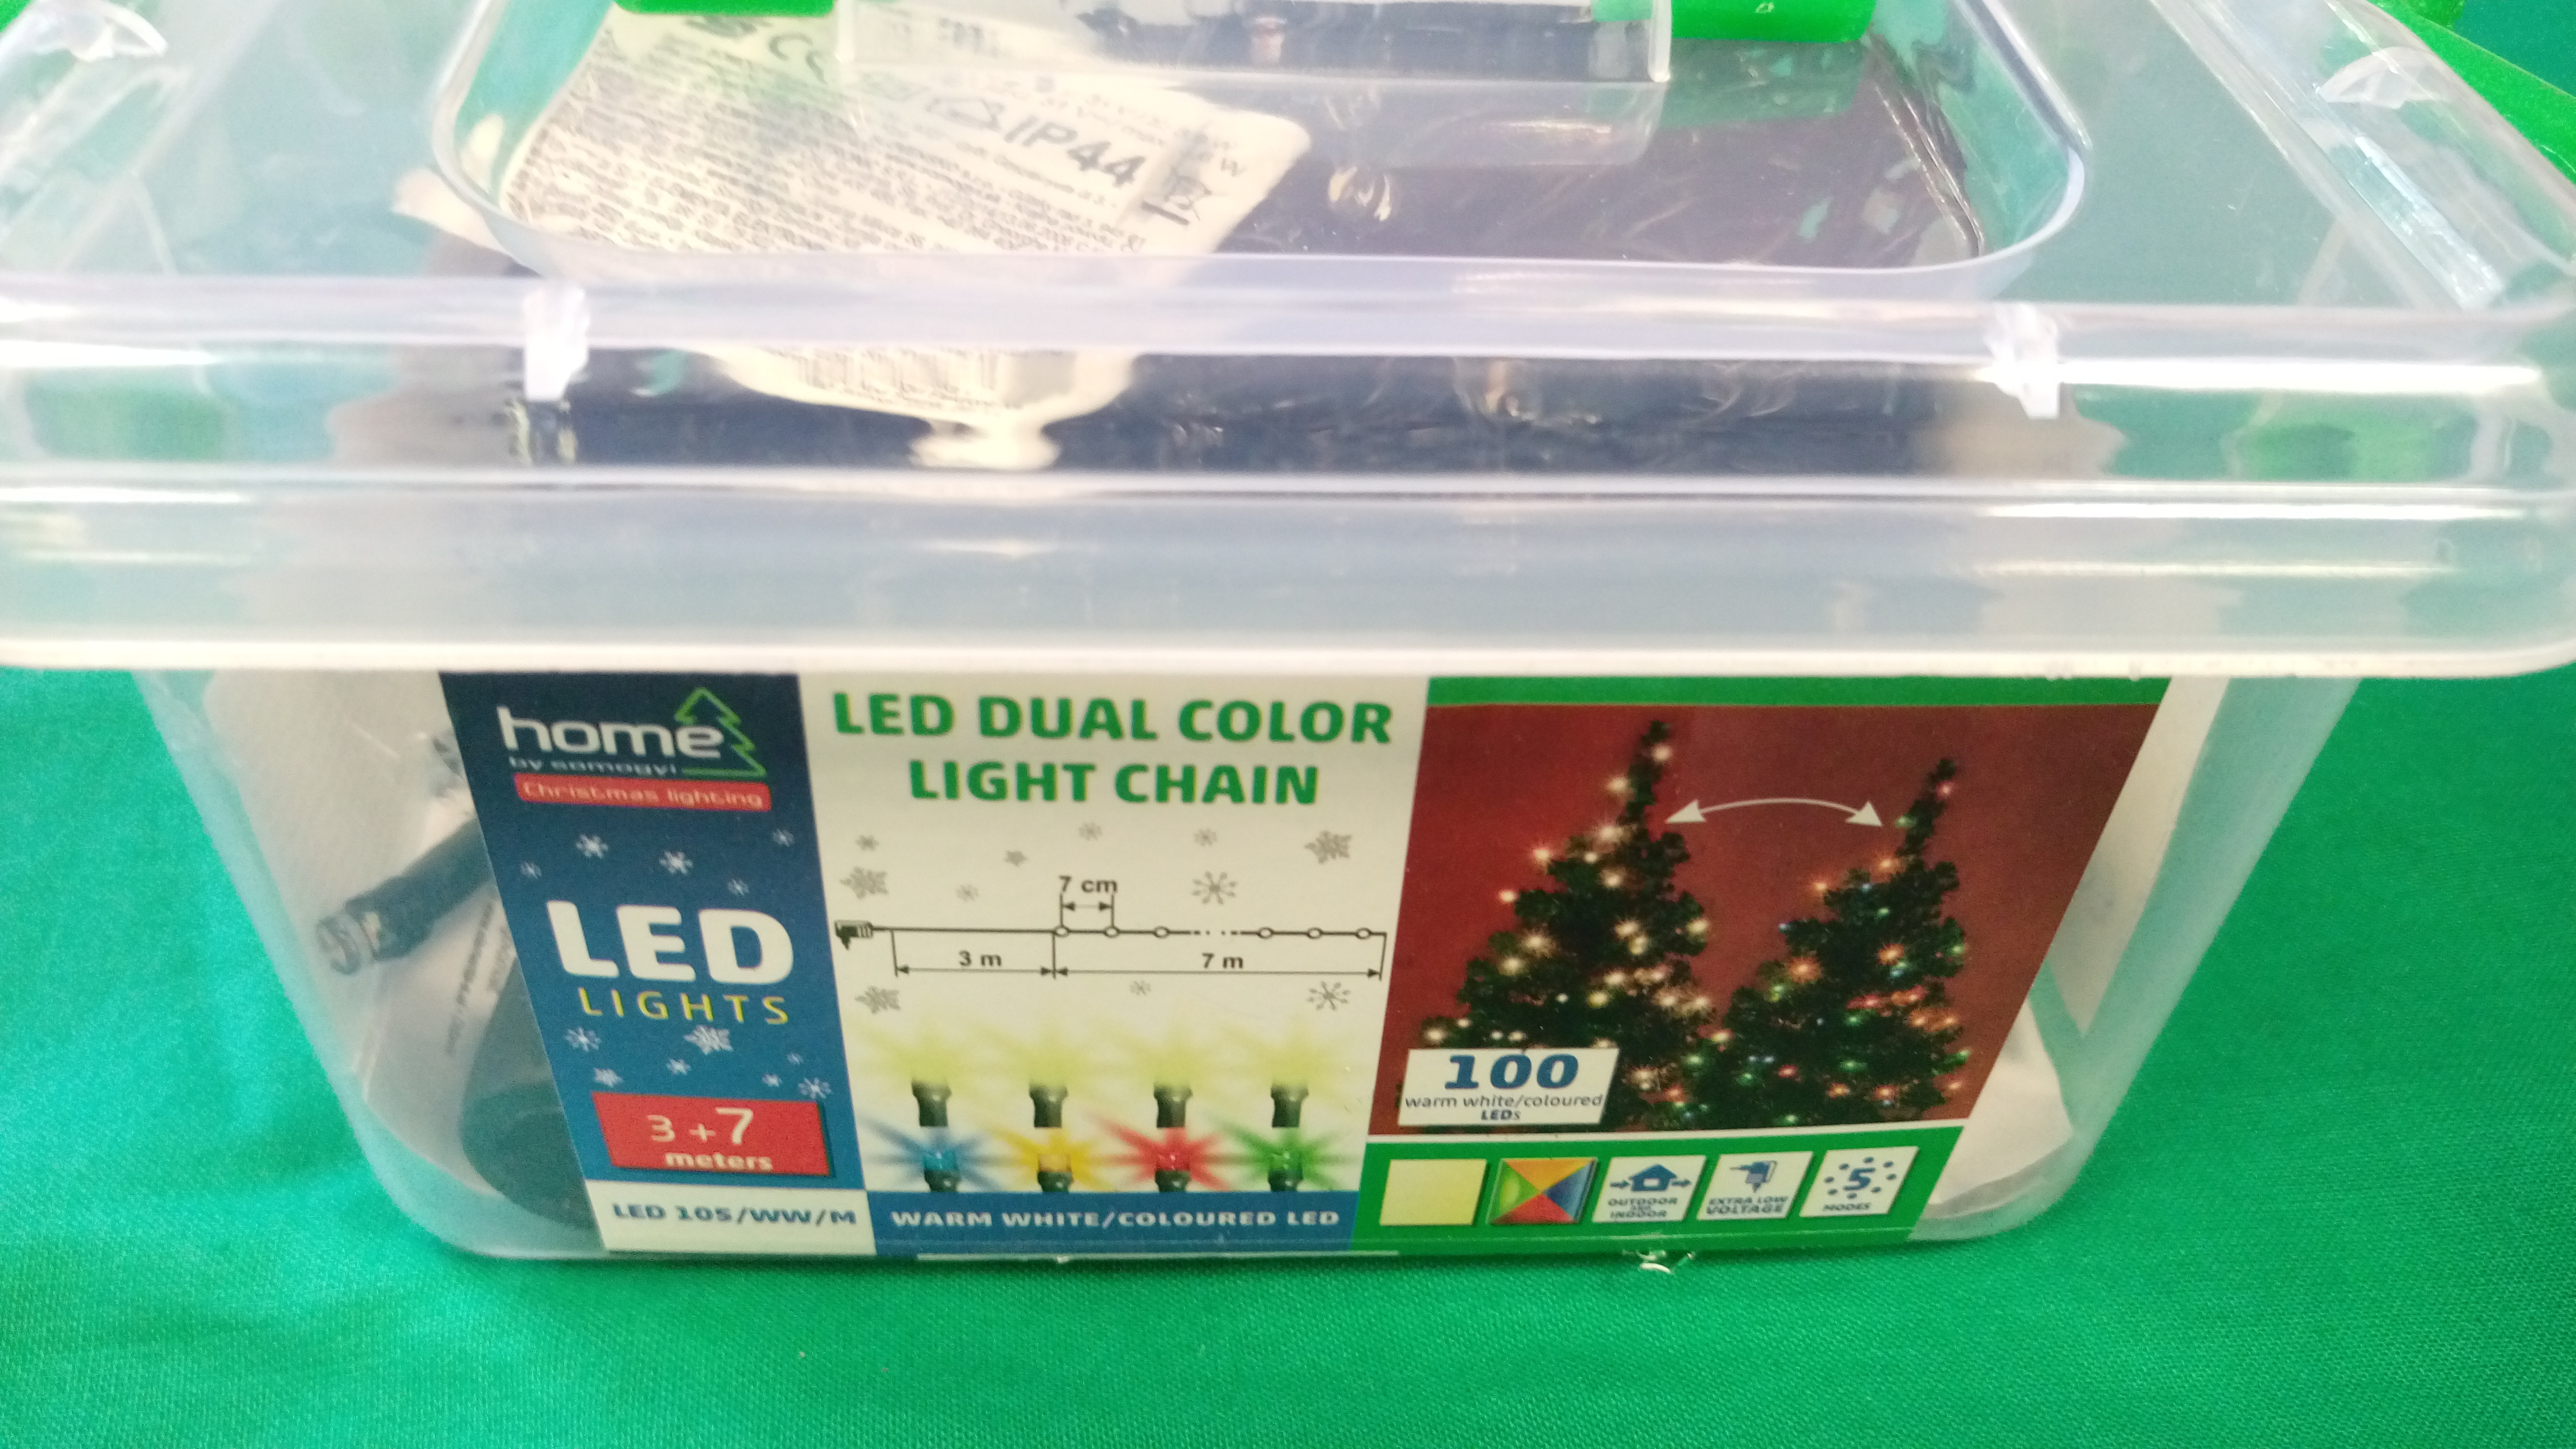 HOME LED-es DUAL COLOR fényfüzér (LED 105/WW/M), kiemelt kép